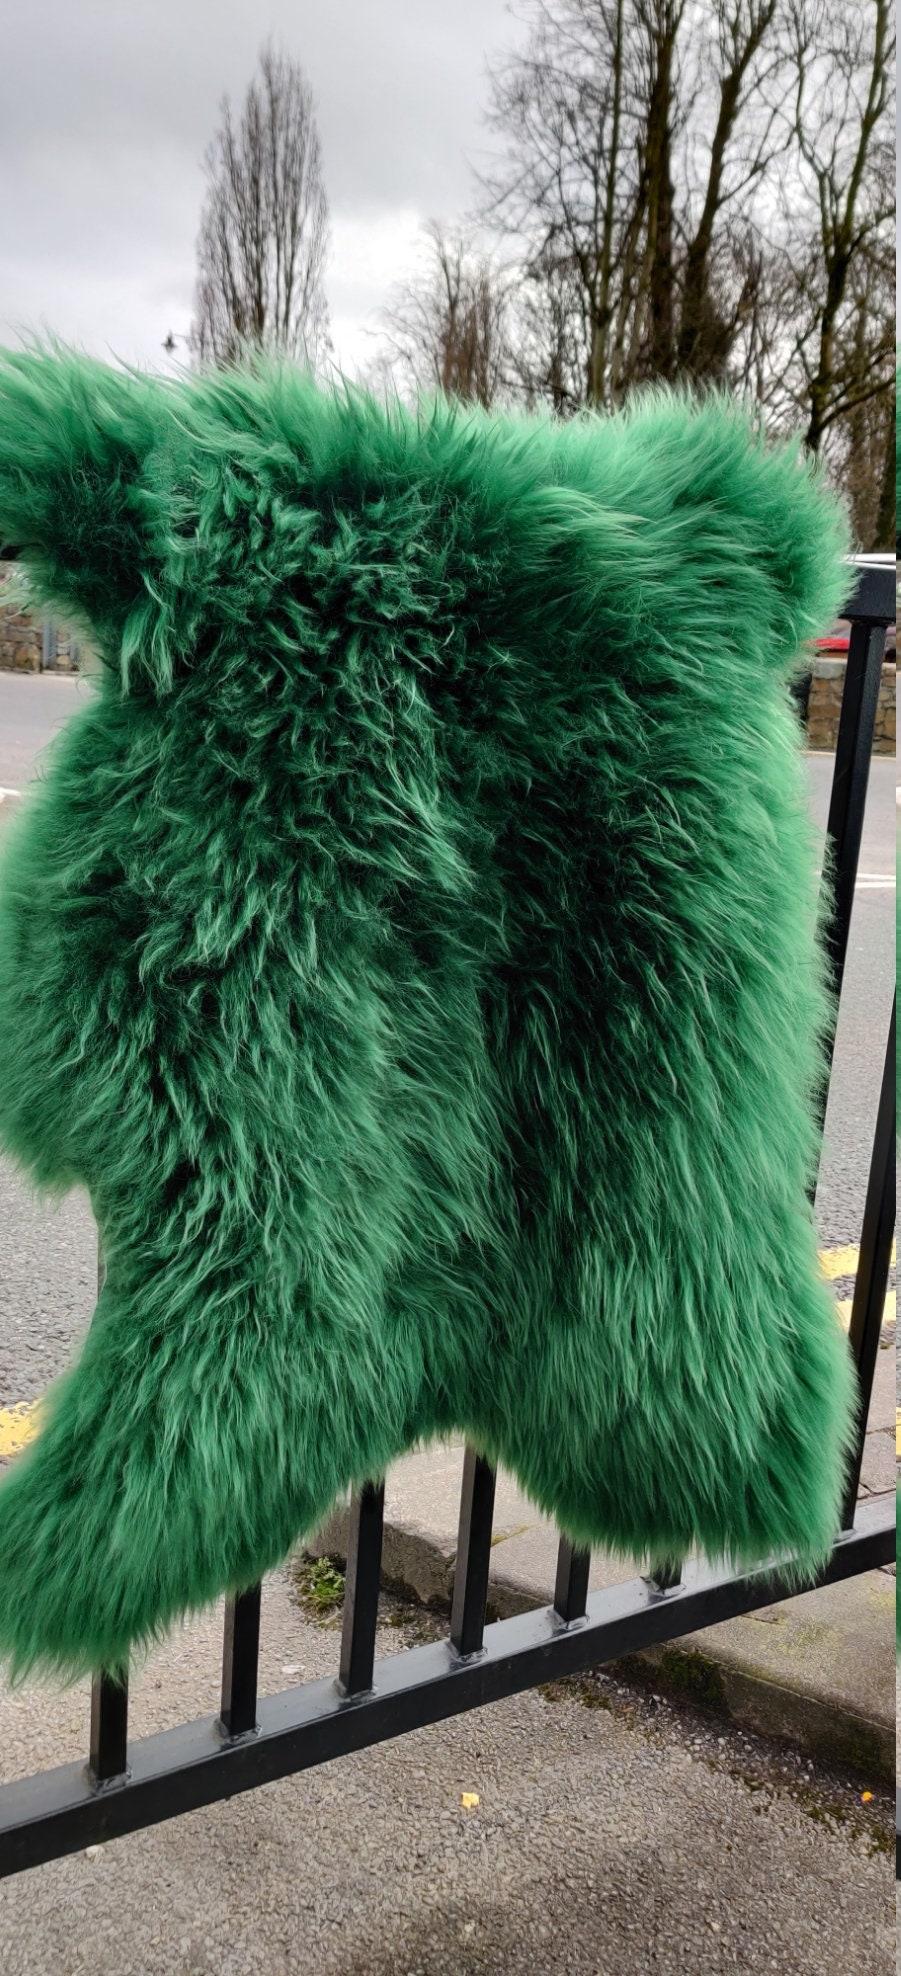 Genuine Irish Sheepskin Rug Dyed Emerald Green Really Soft Thick Free Worldwide Shipping From Ireland